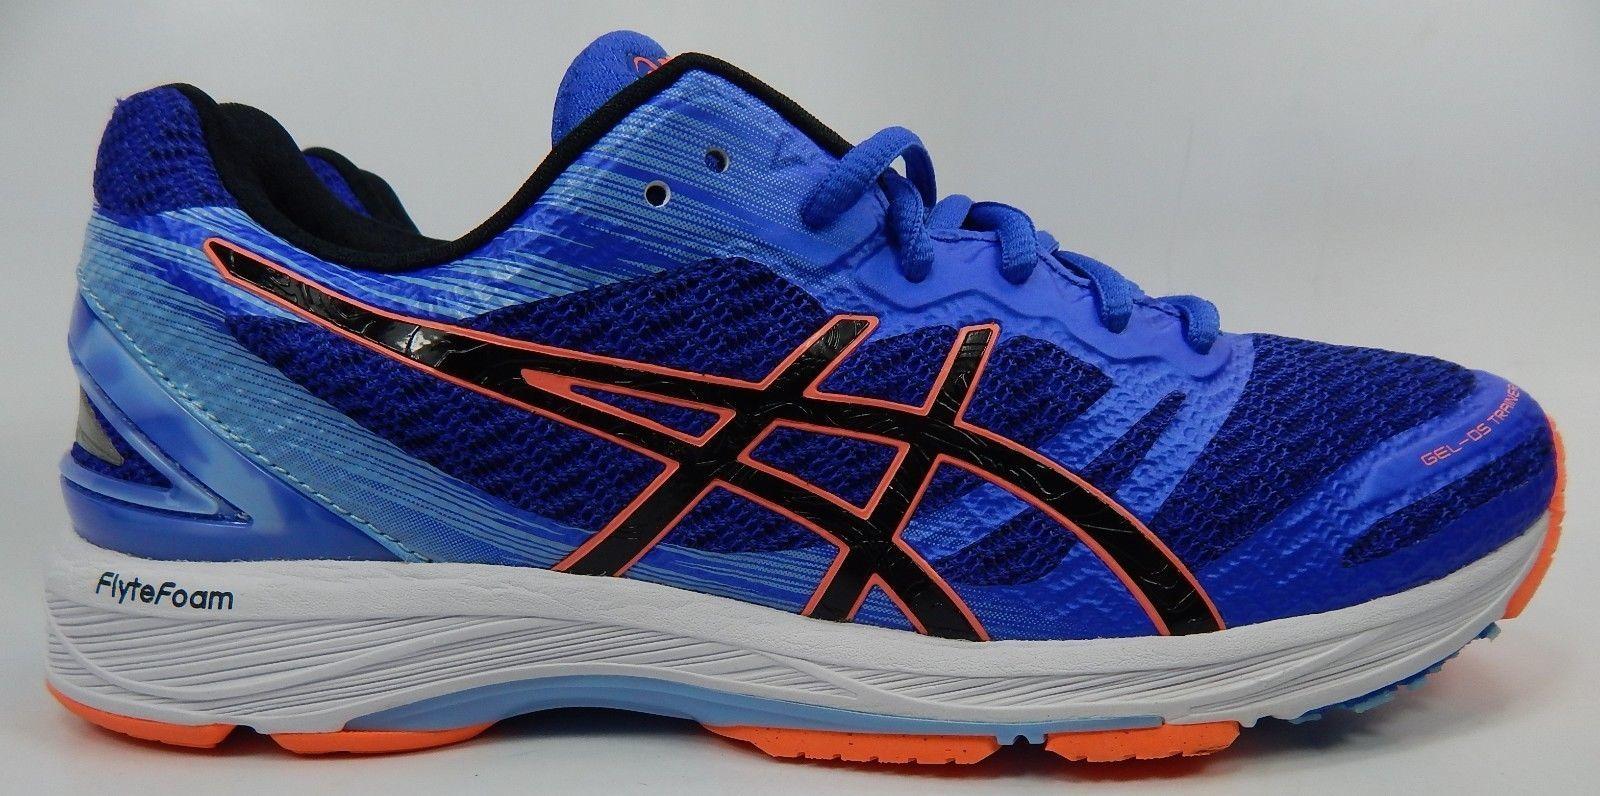 Asics Gel DS Trainer 22 Running Shoes Women's Size US 8 M (B) EU 39.5 Blue T770N